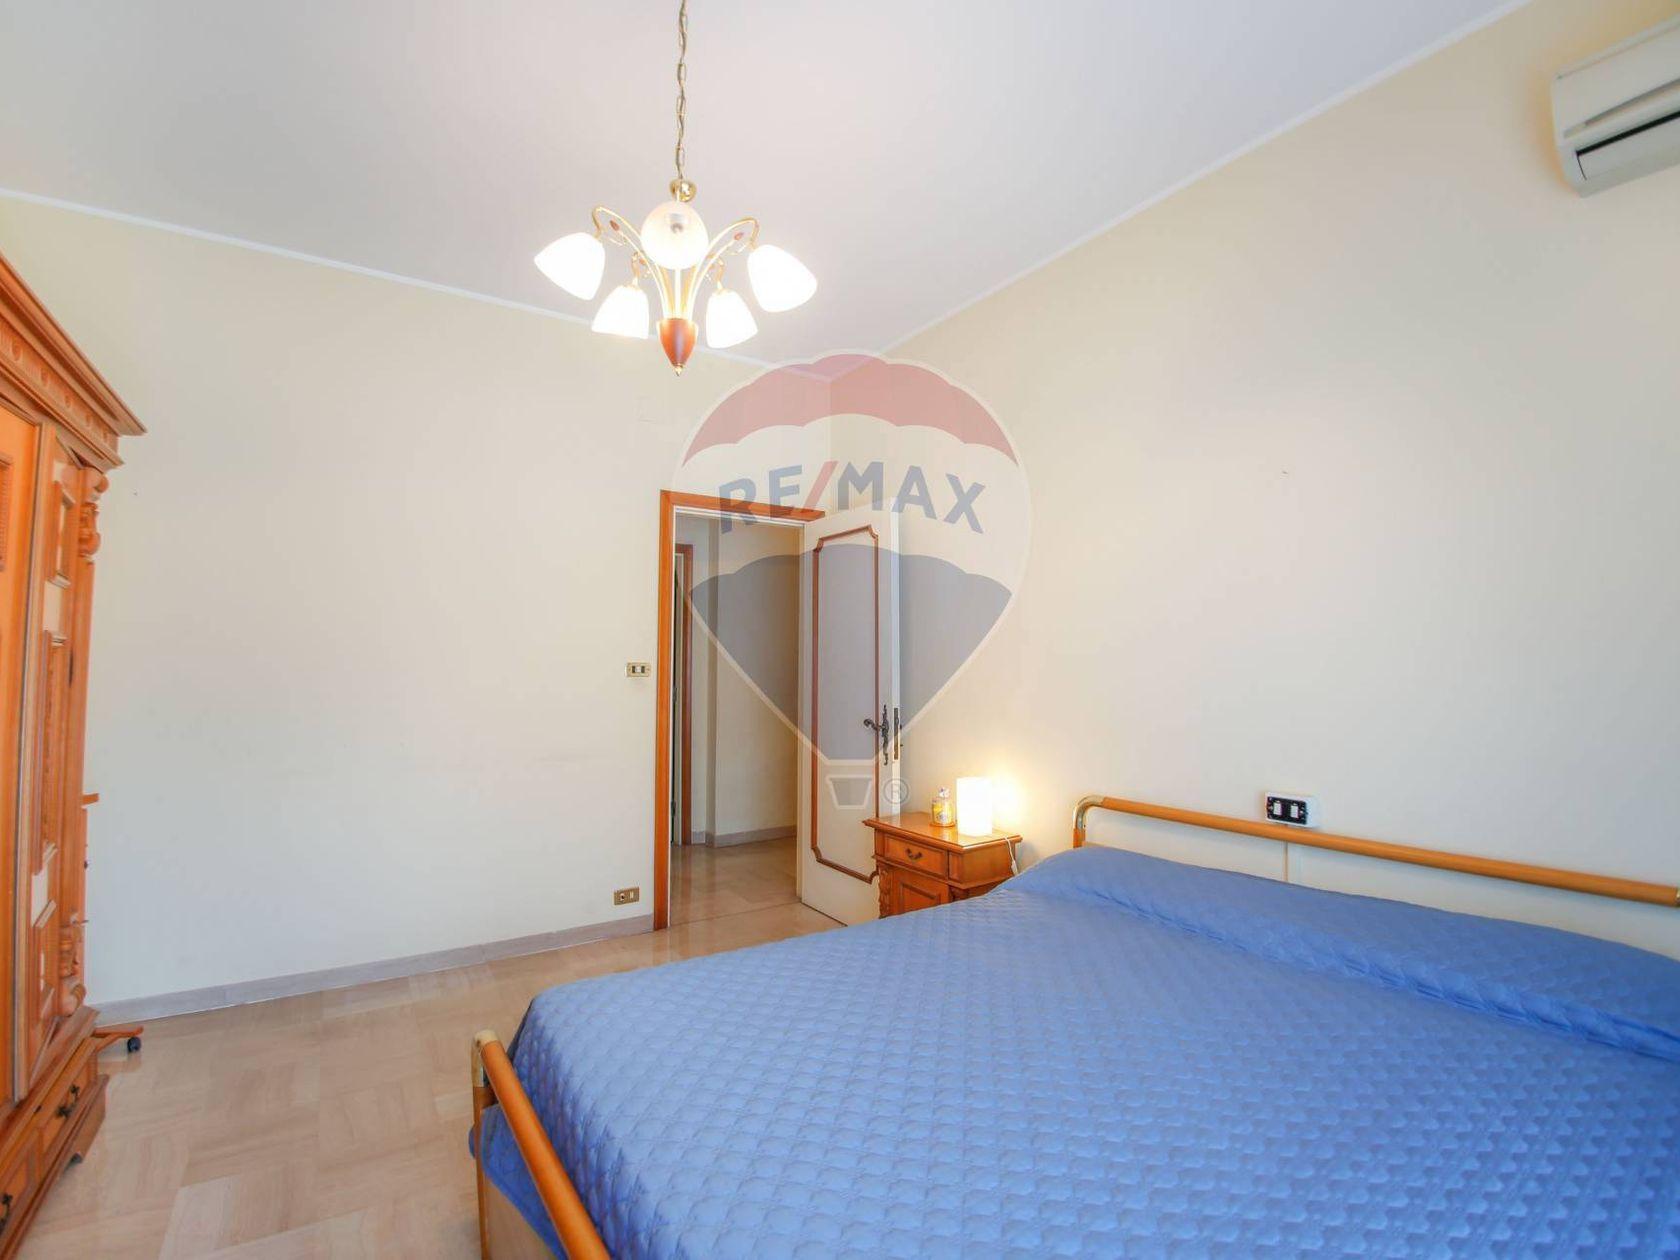 Appartamento Zona Ospedale, Pescara, PE Vendita - Foto 13